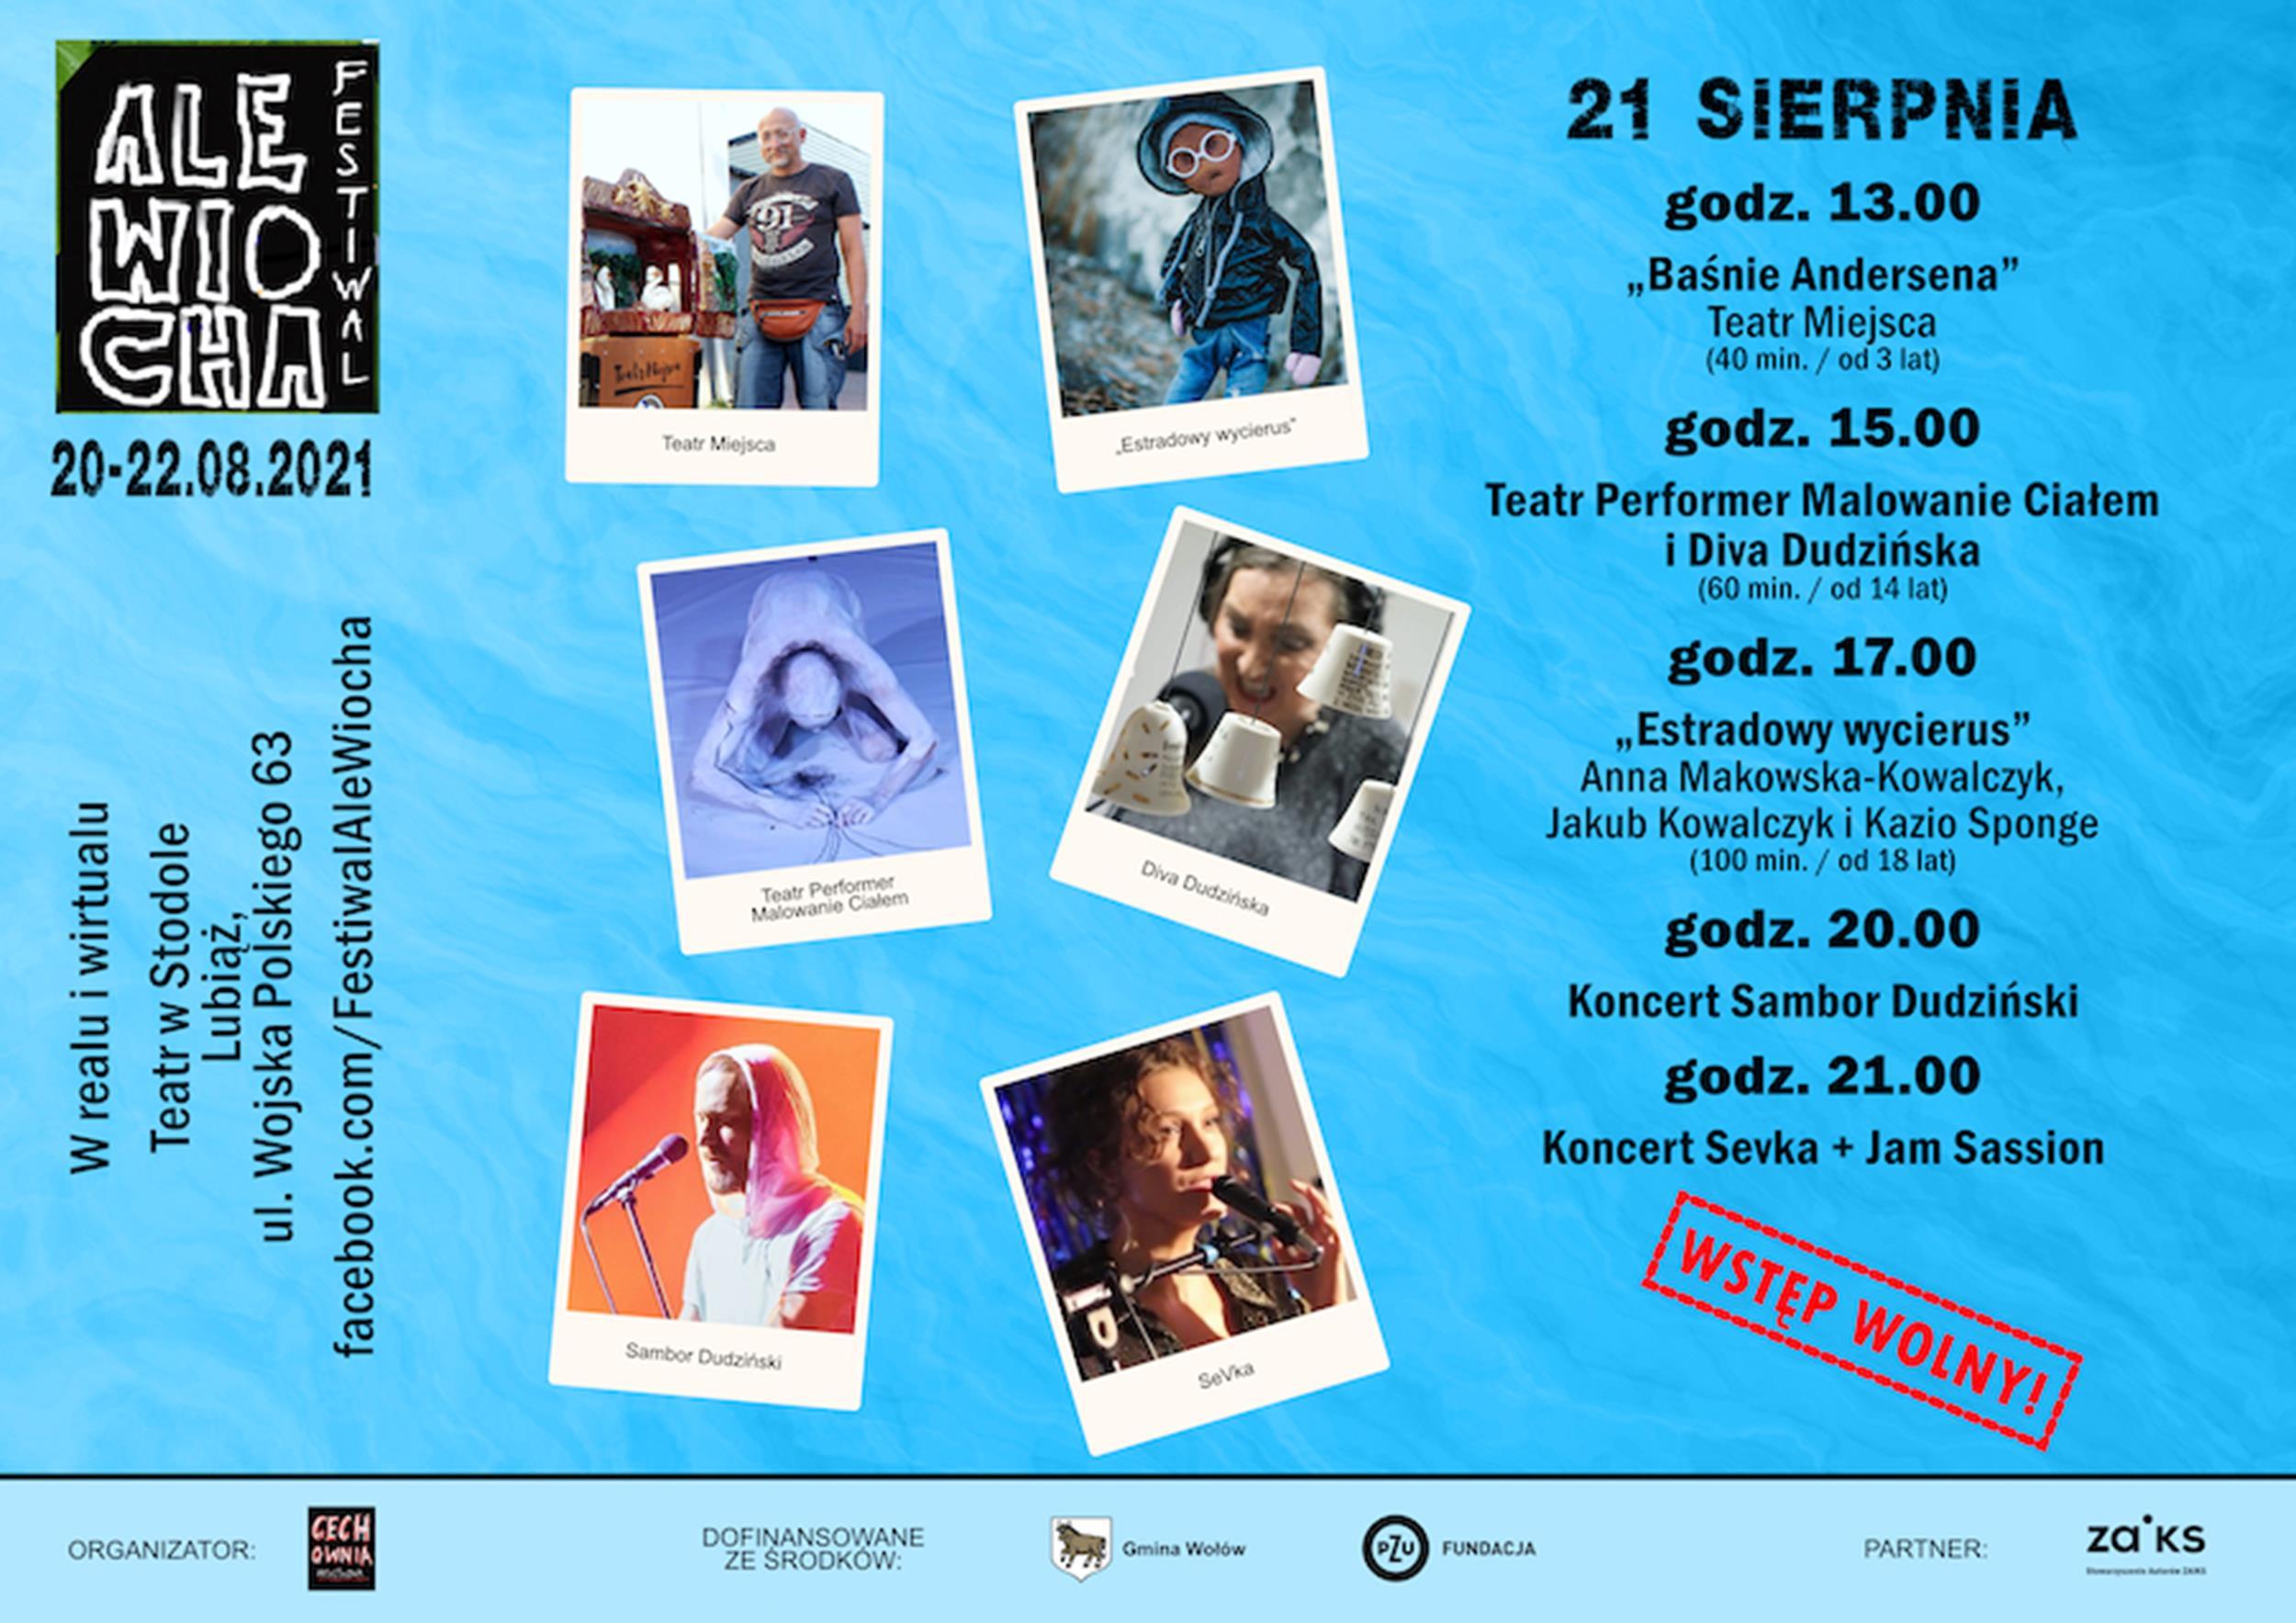 Festiwal Ale Wiocha 2021 Program (Dzień 2)